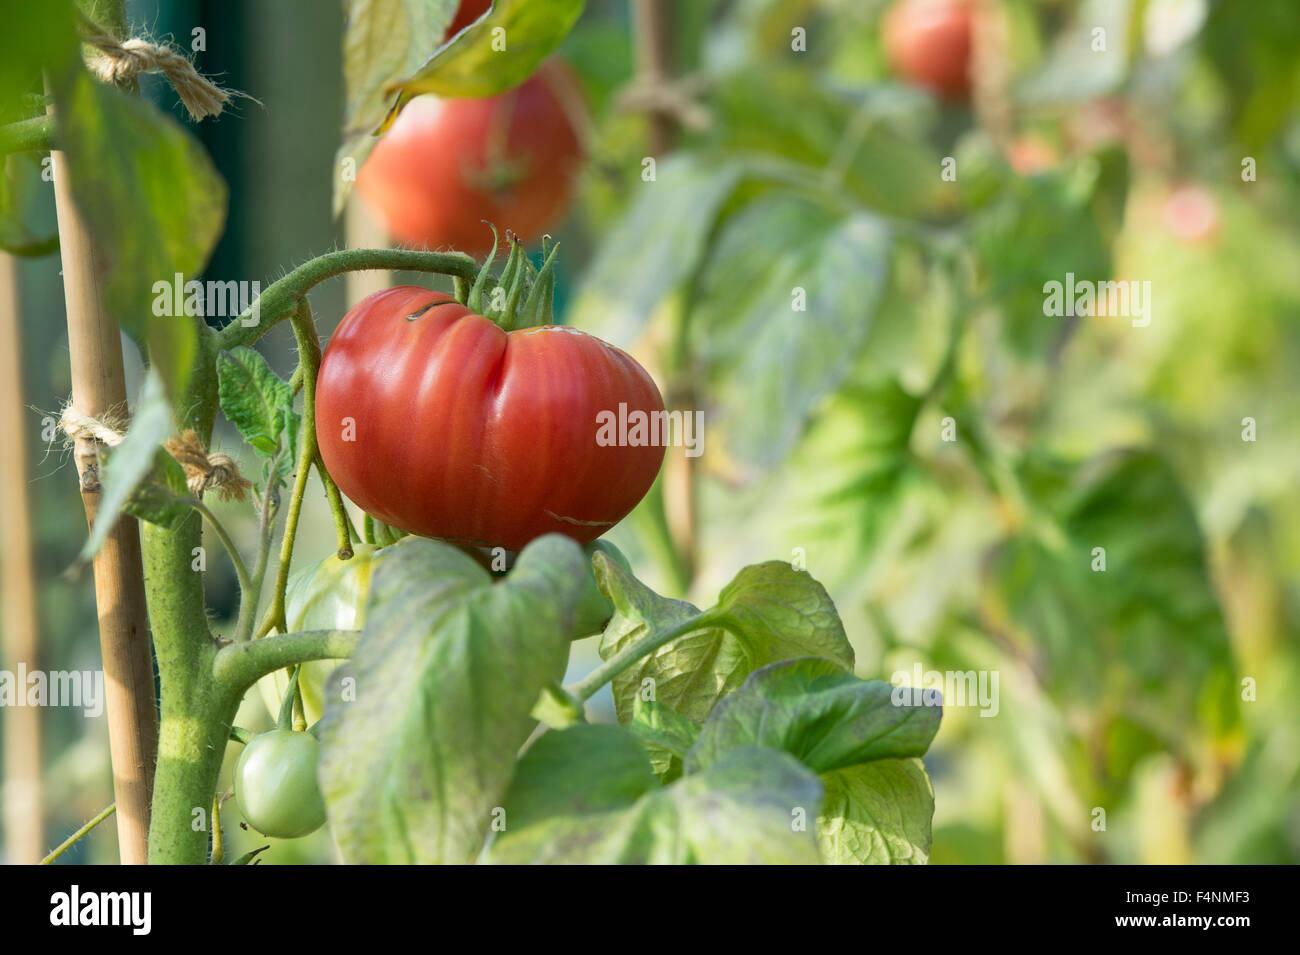 Tomato Pink Brandywine ripening on the vine - Stock Image